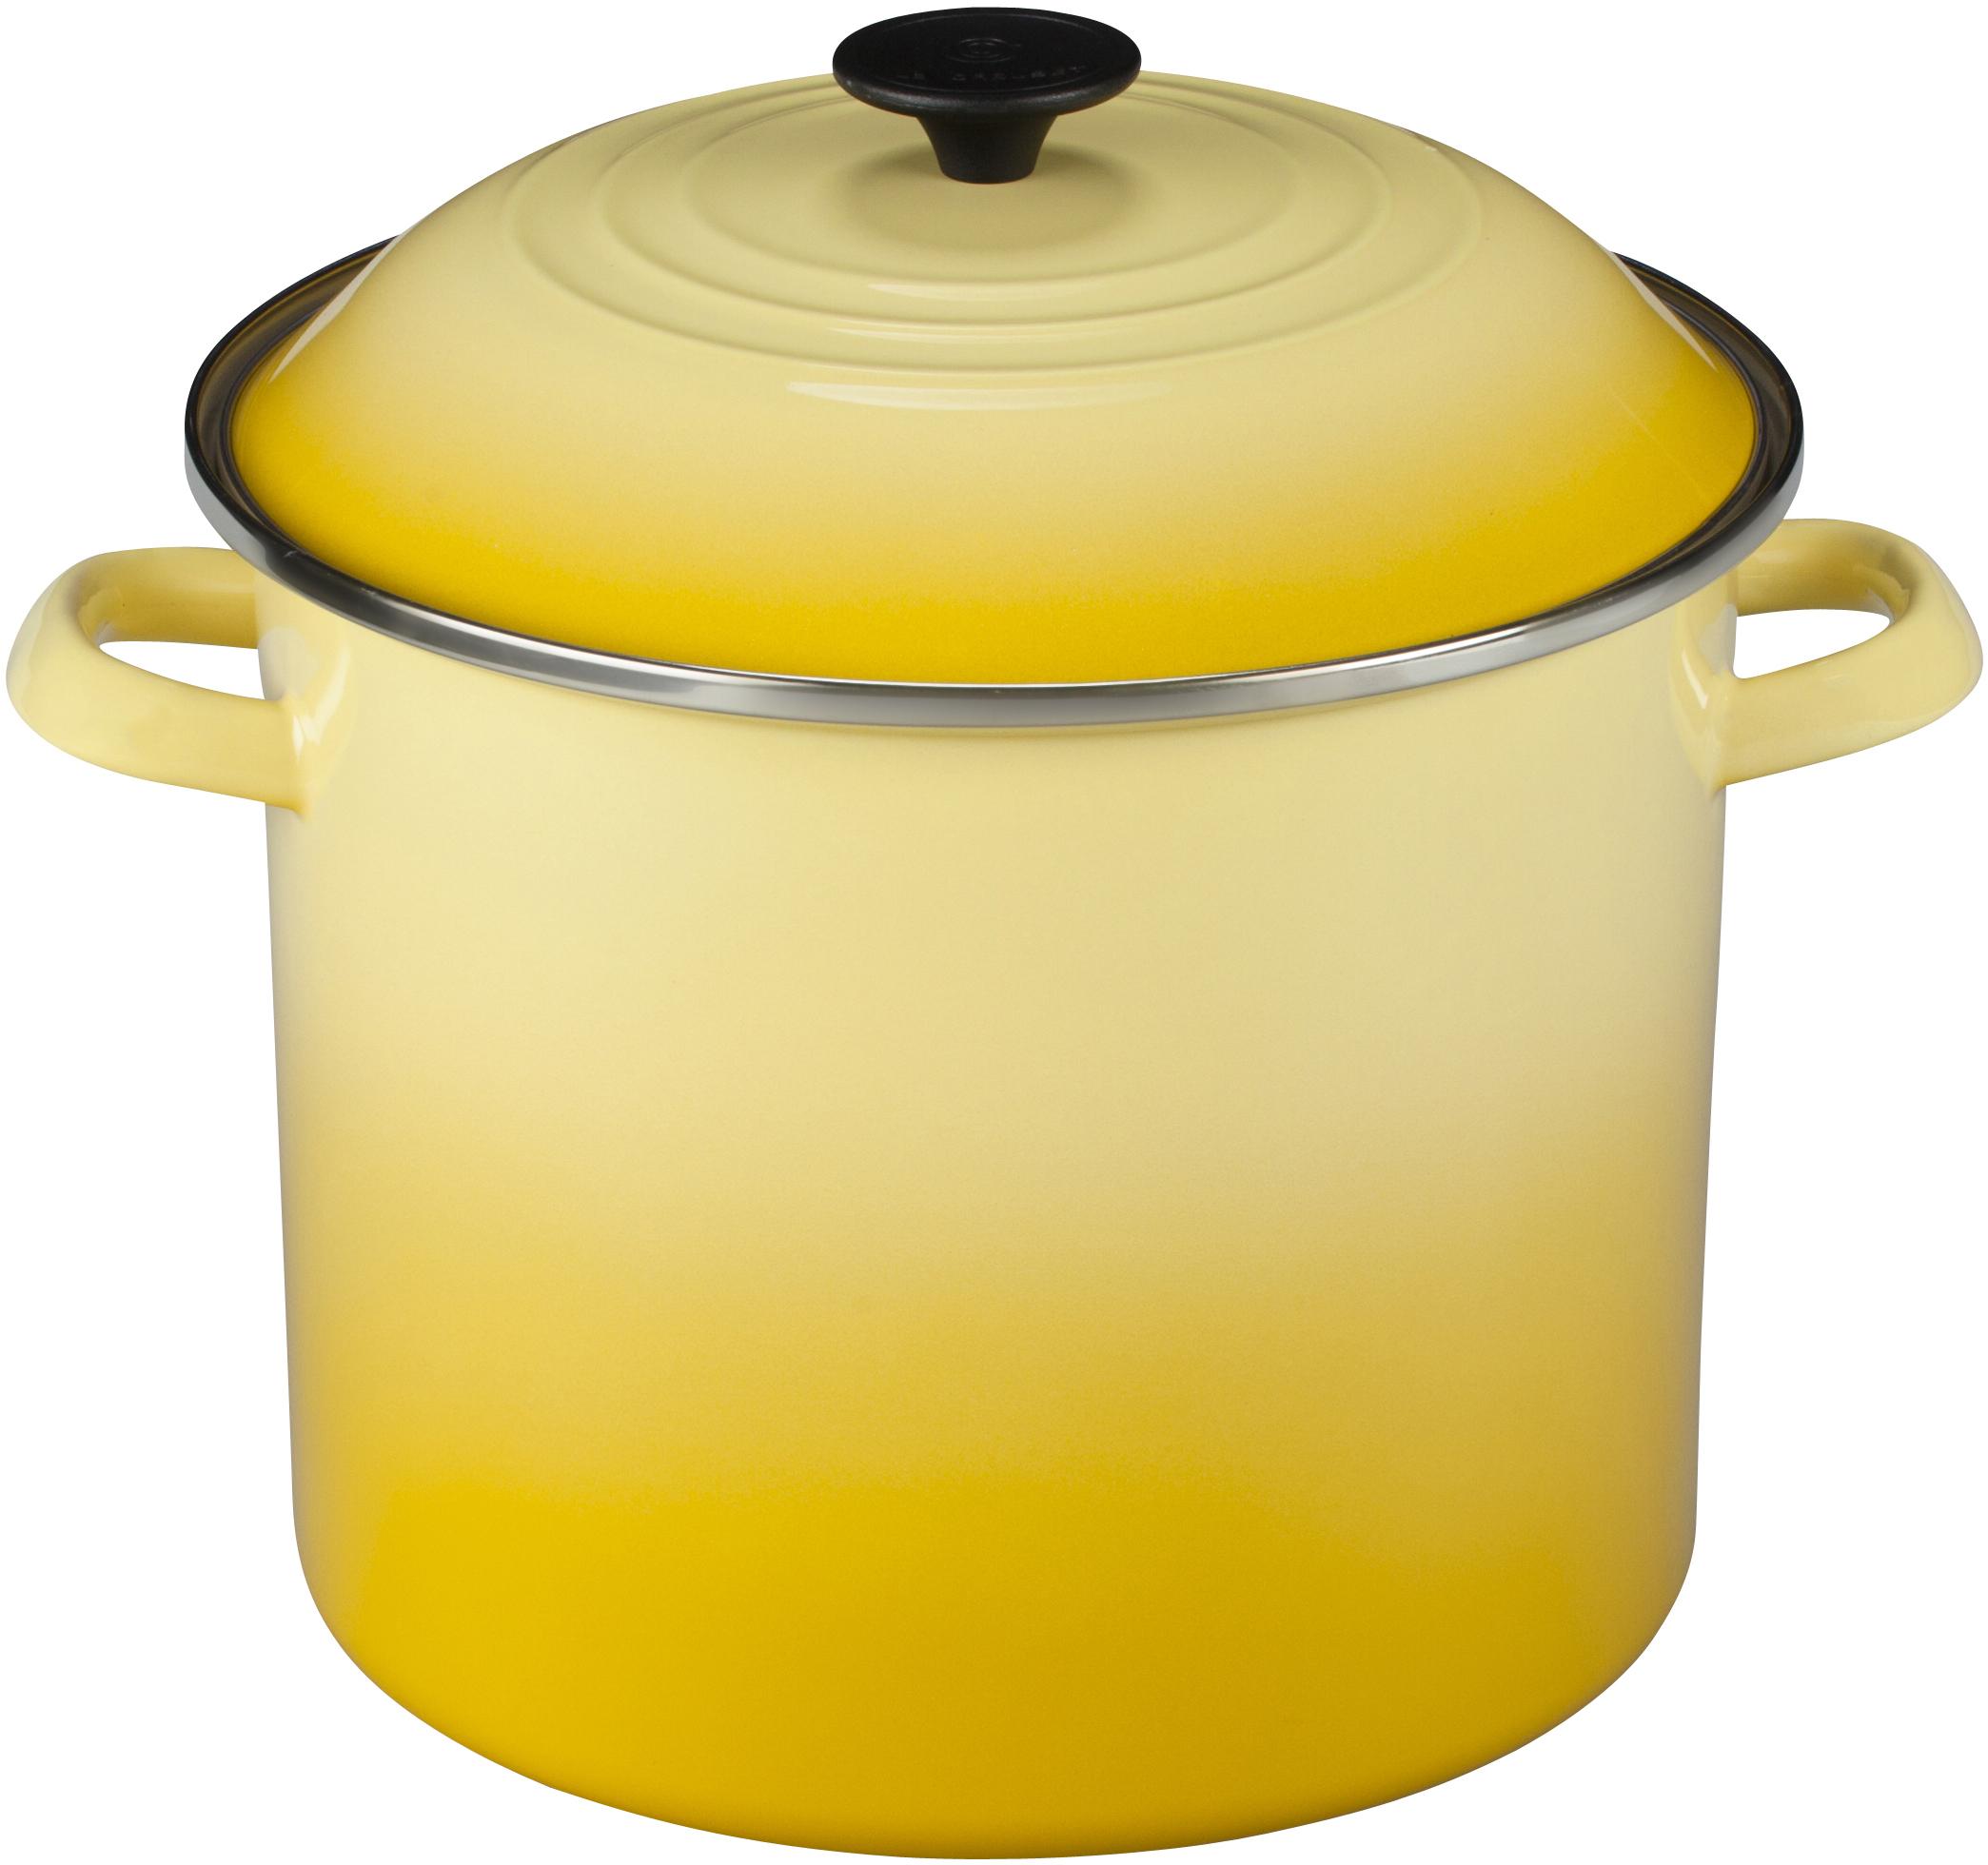 Le Creuset Soleil Yellow Enamel on Steel Stockpot, 12 Quart